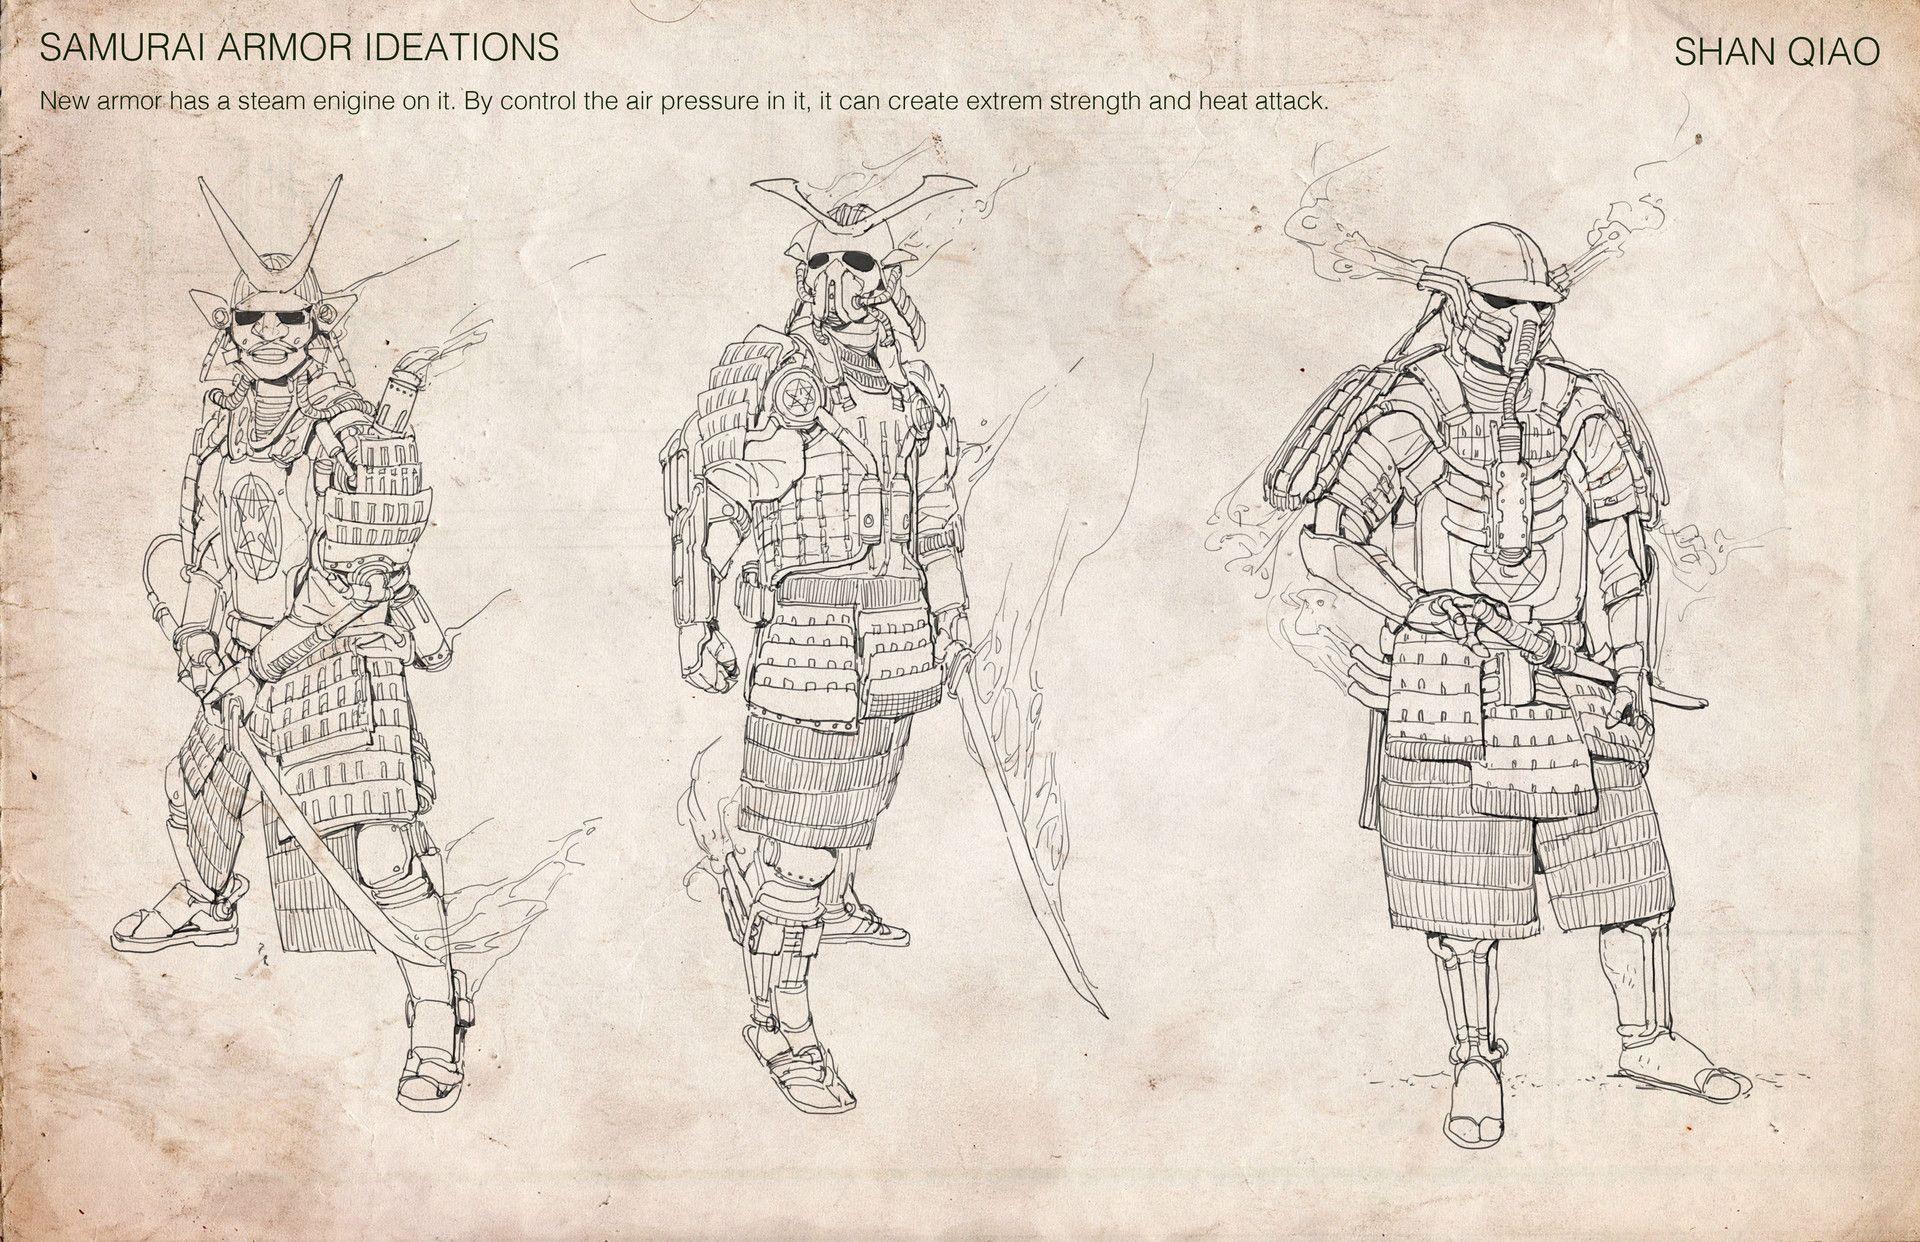 ArtStation - Steampunk samurai mash up! , Shan Qiao